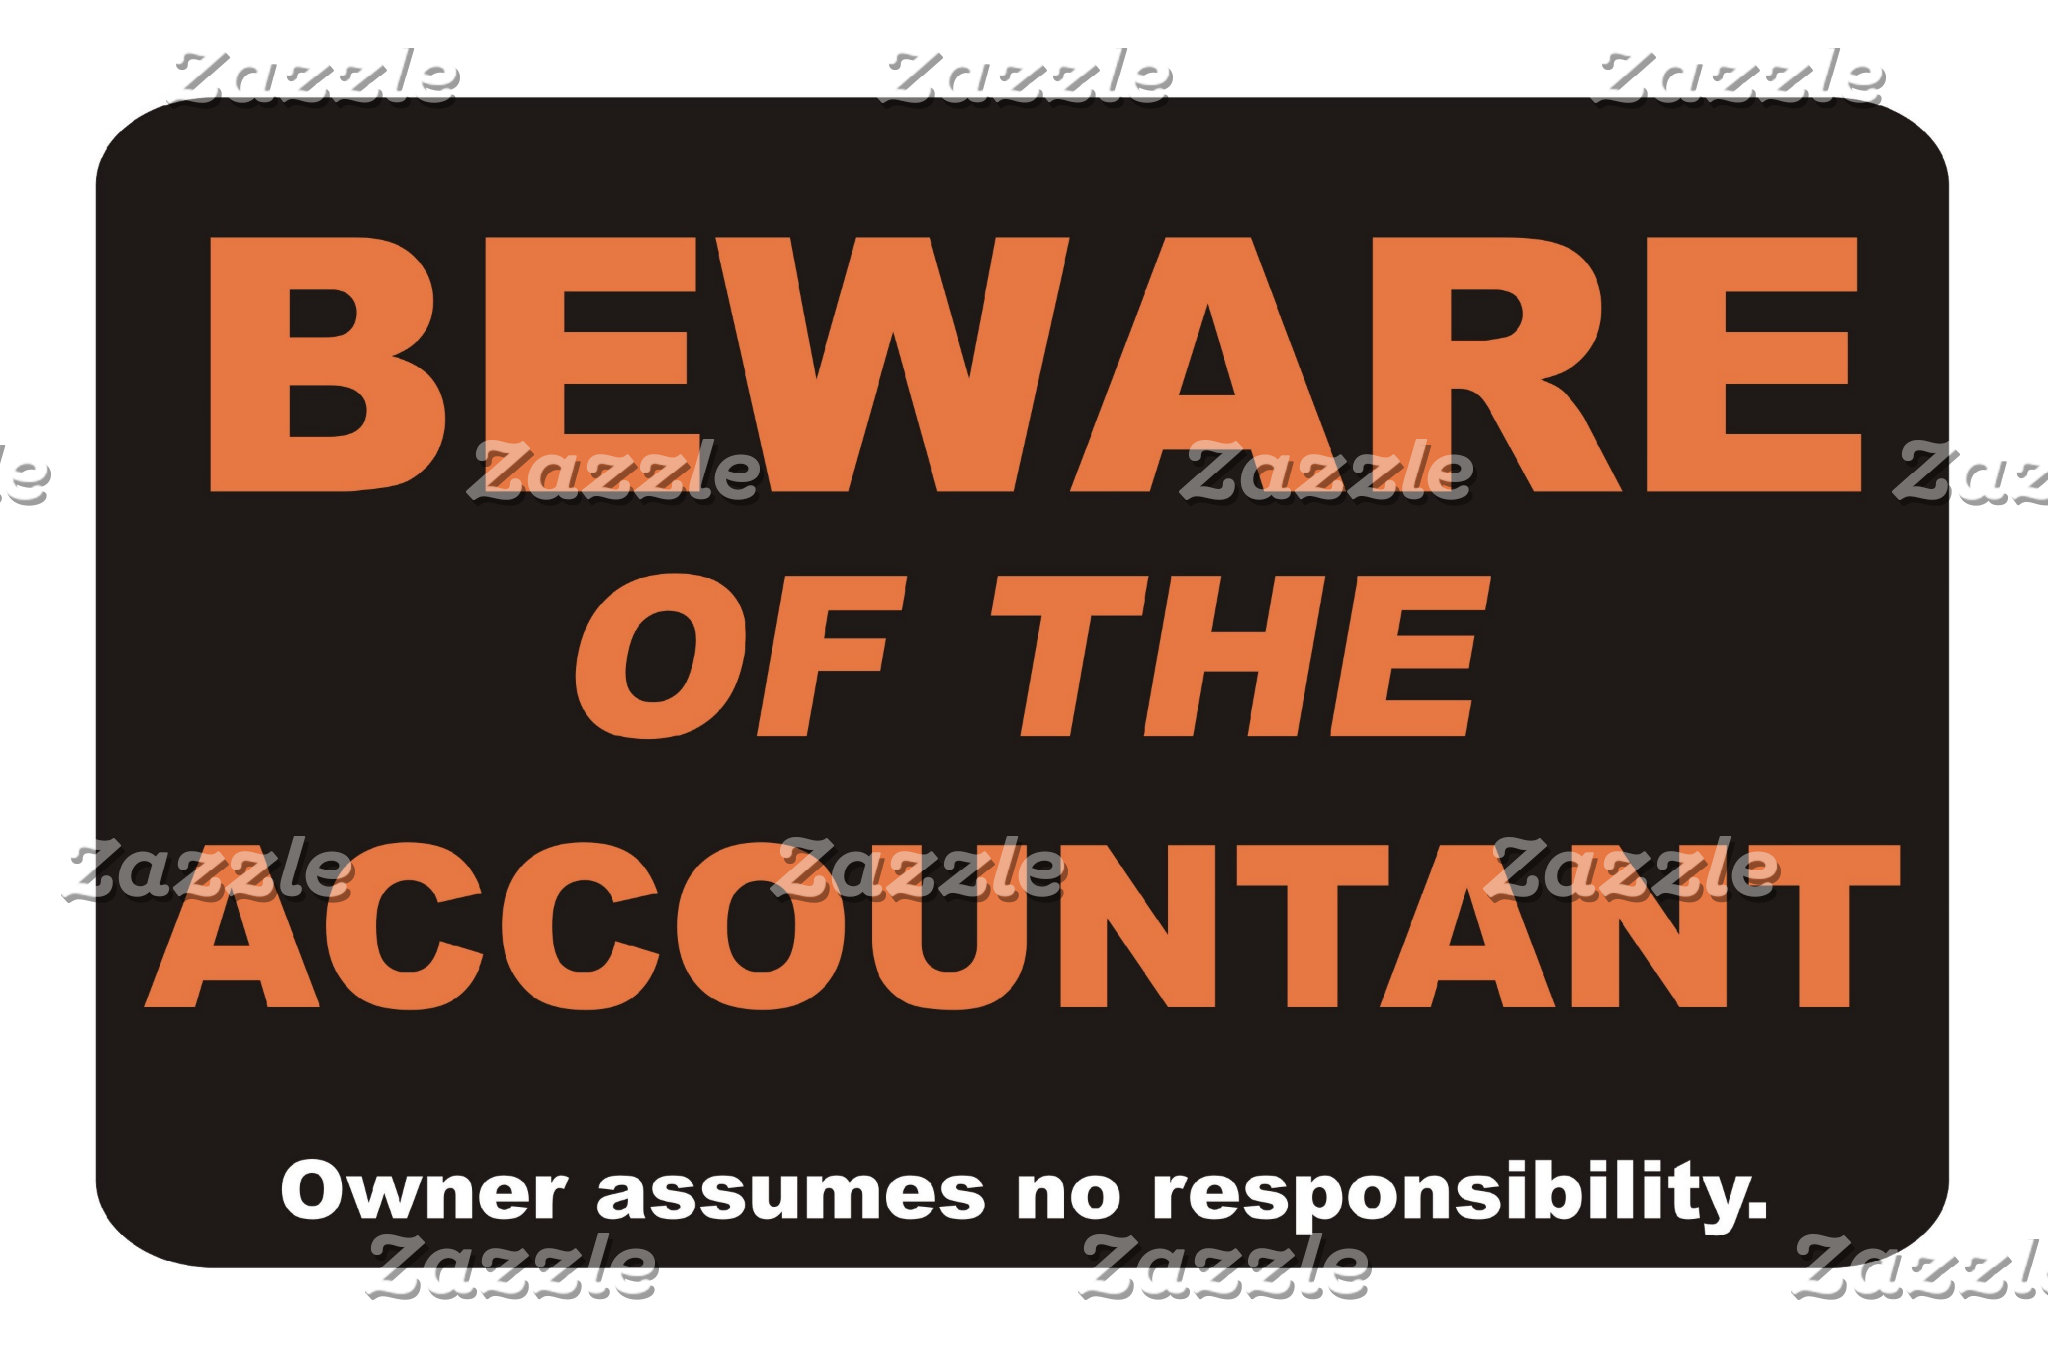 Beware of the Accountant